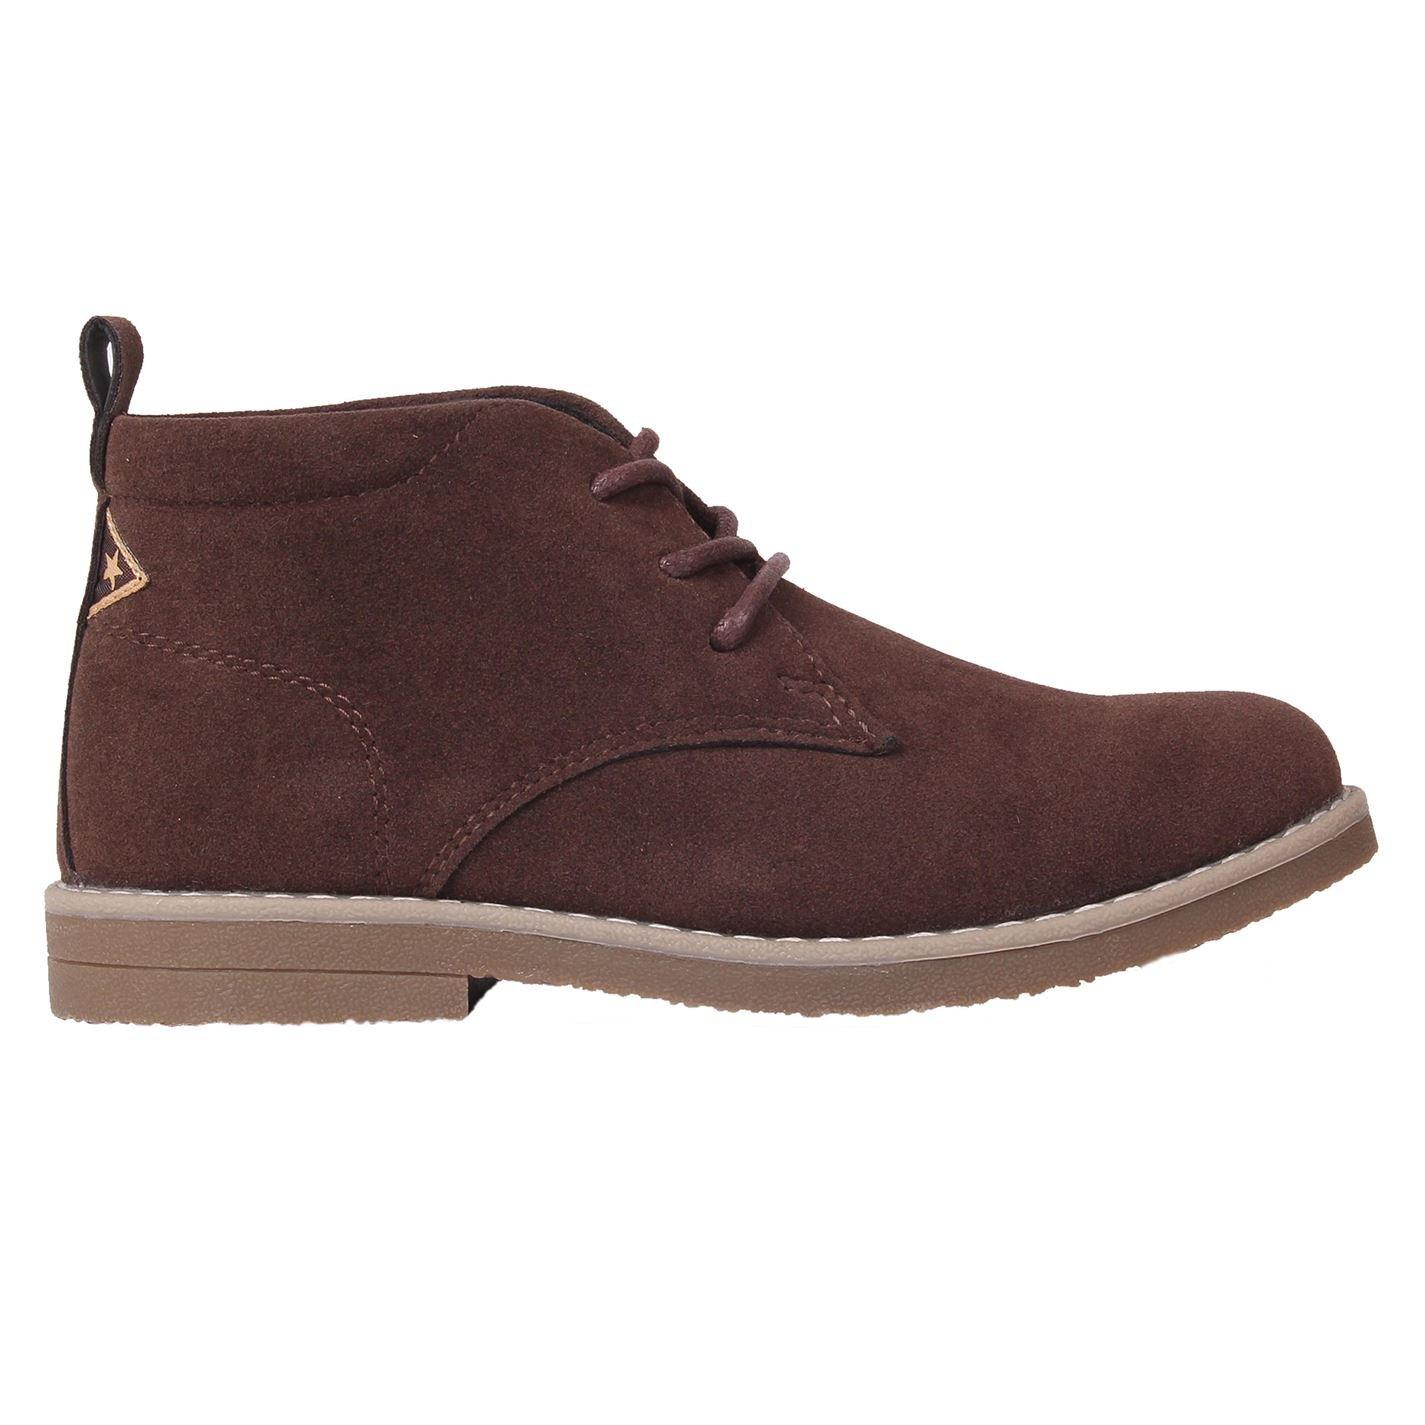 Soviet Kids Boys Desert Child Boots Lace Up Comfortable Fit Tonal Stitching Brown UK C11 (29)